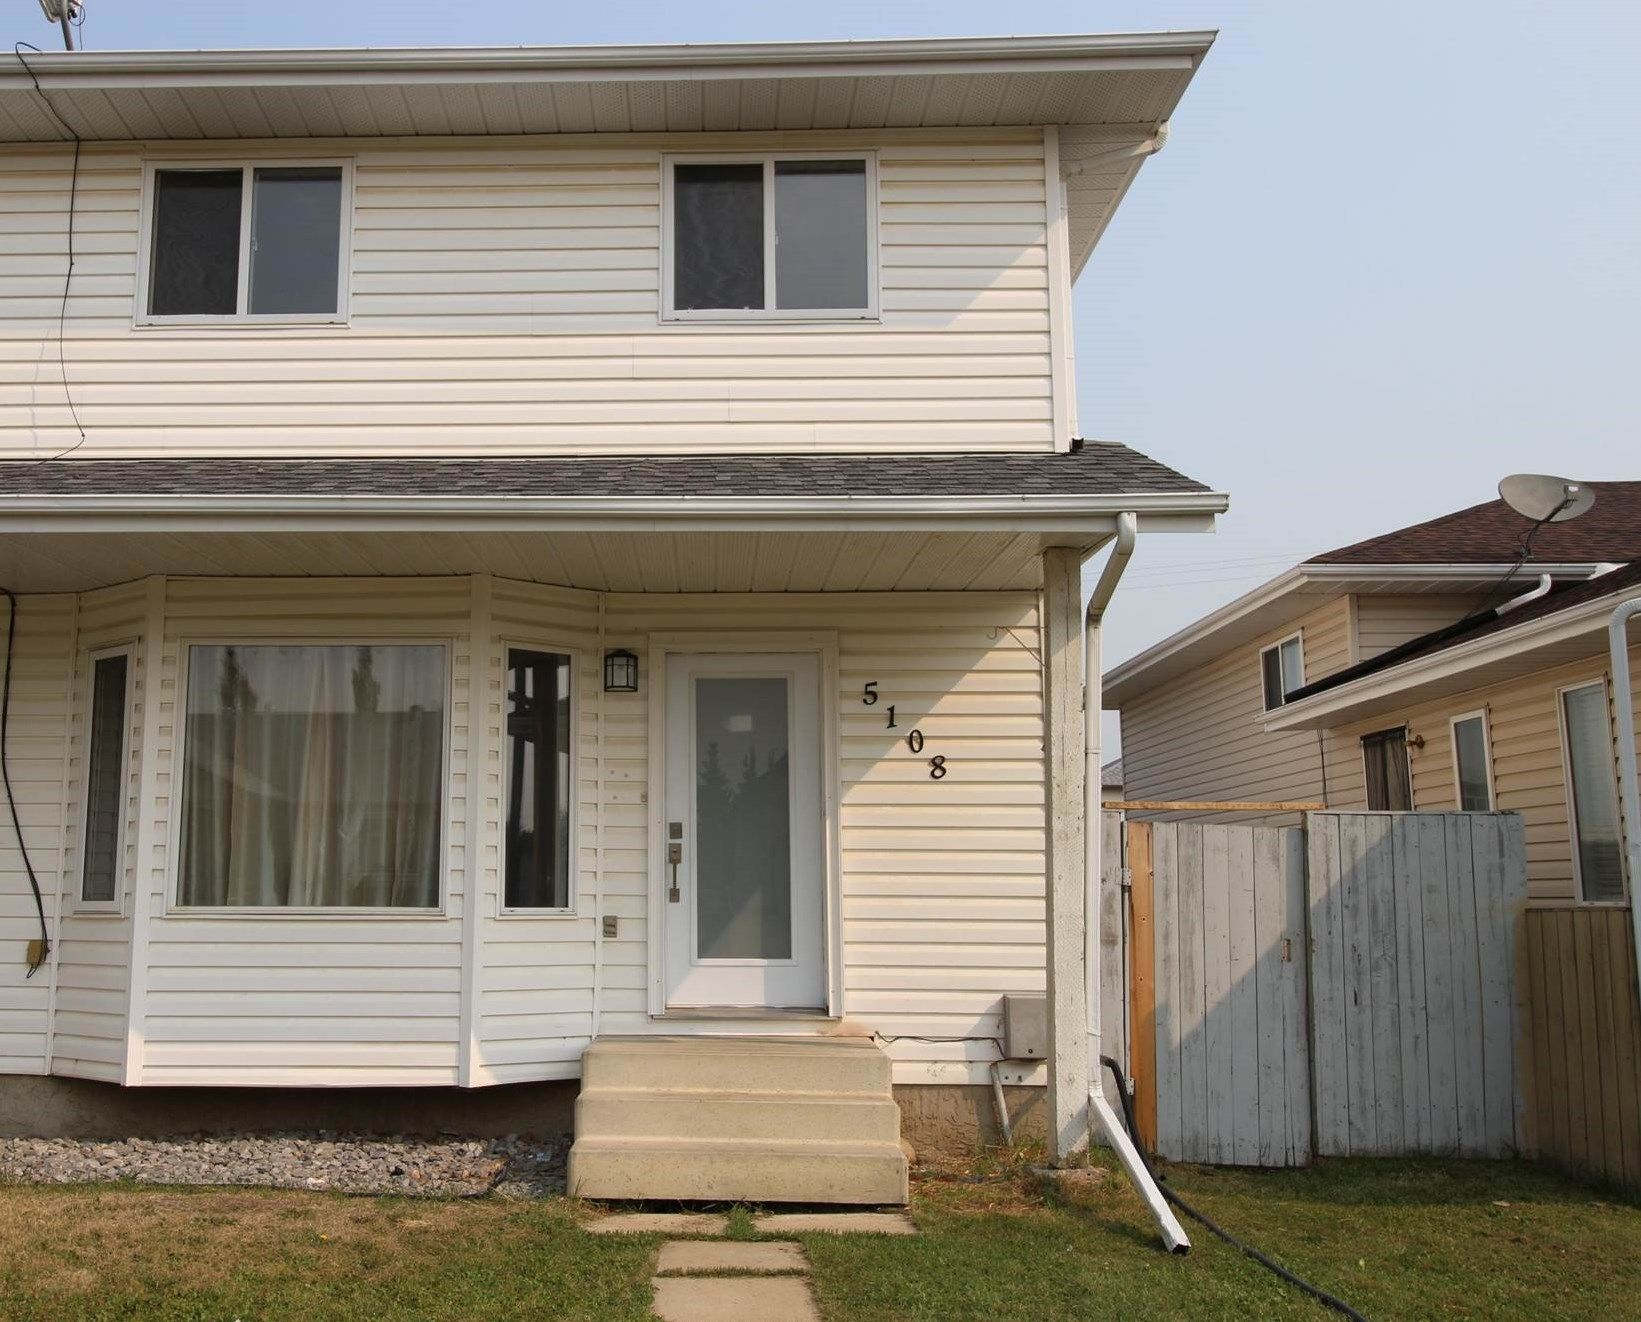 Main Photo: 5108 52 Avenue: Calmar House Half Duplex for sale : MLS®# E4256866